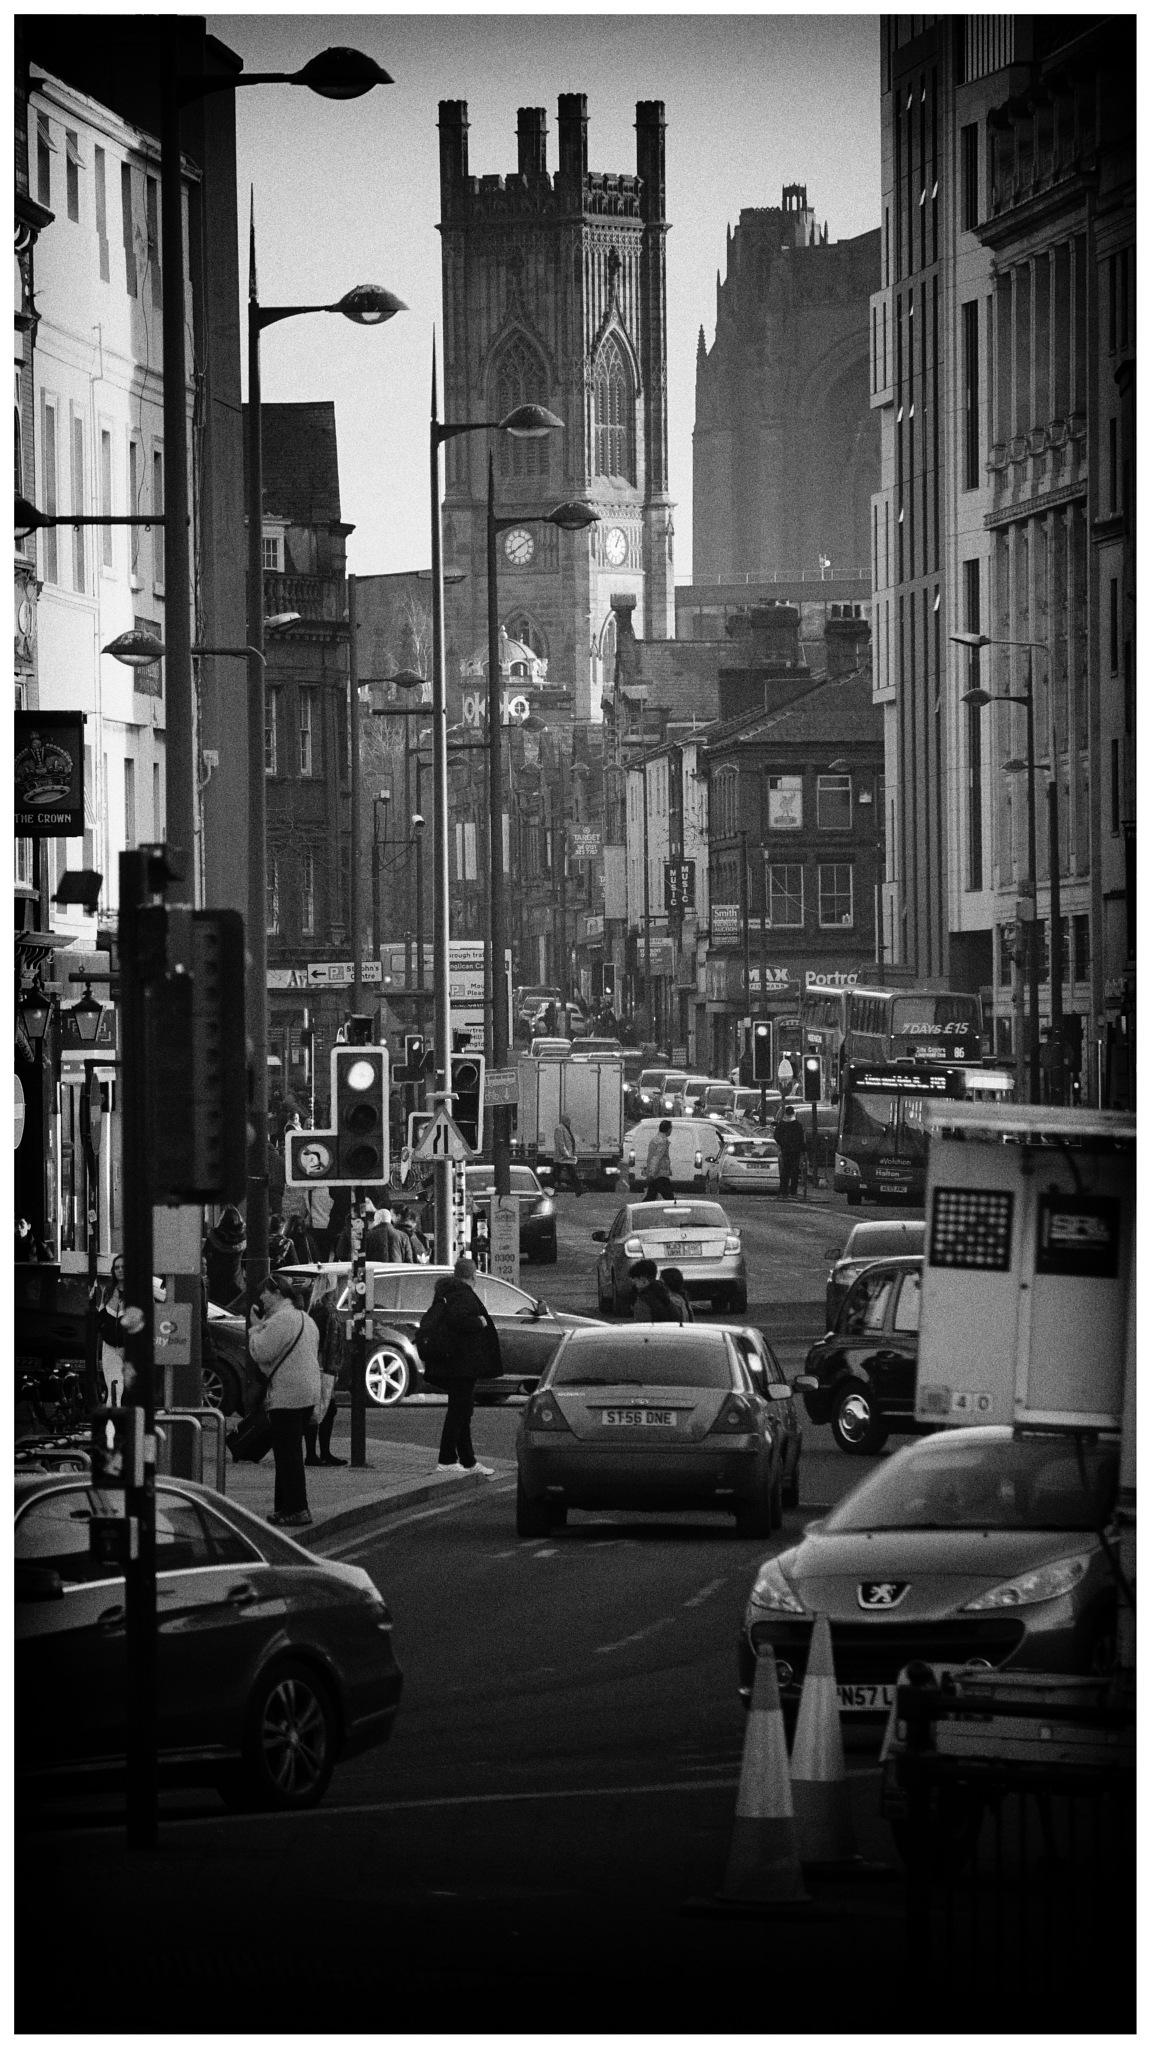 liverpool, uk, bustling street. by Robert Beattie